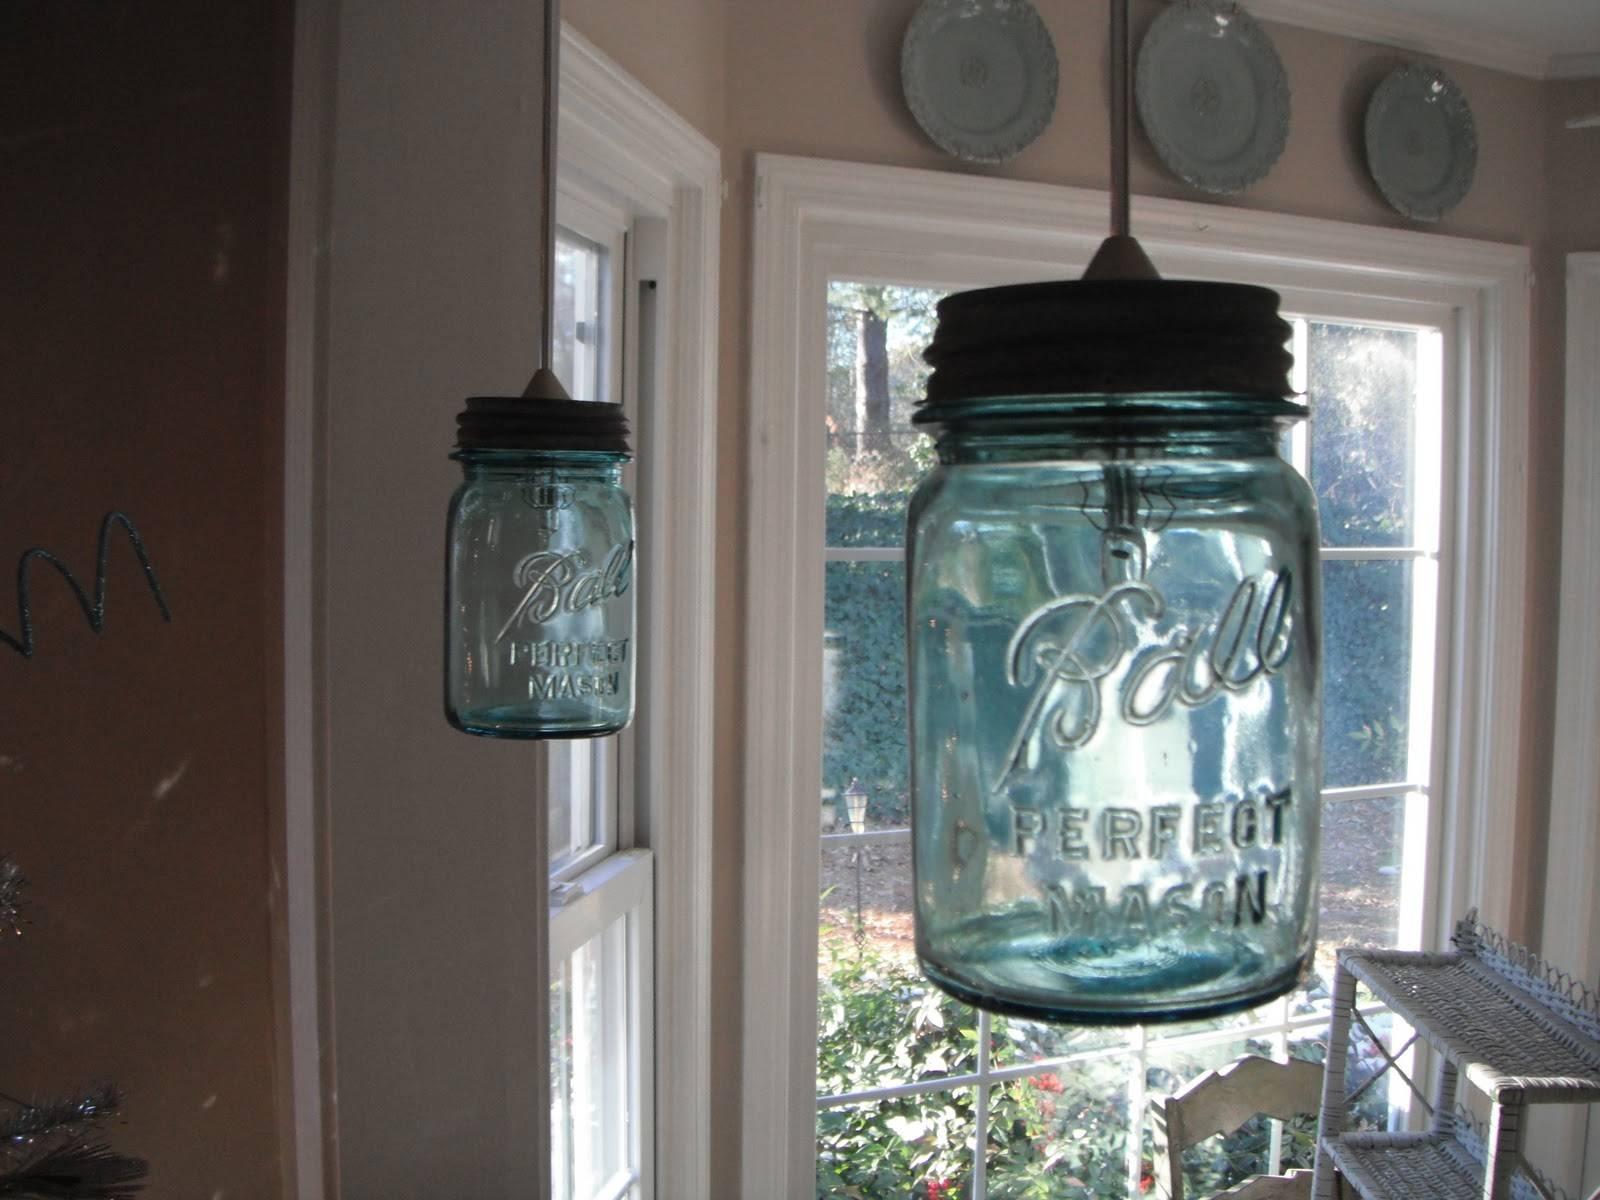 Ceiling Lights : Stunning Track Lighting Pendant Exposed Bulb regarding Ball Jar Pendant Lights (Image 5 of 15)